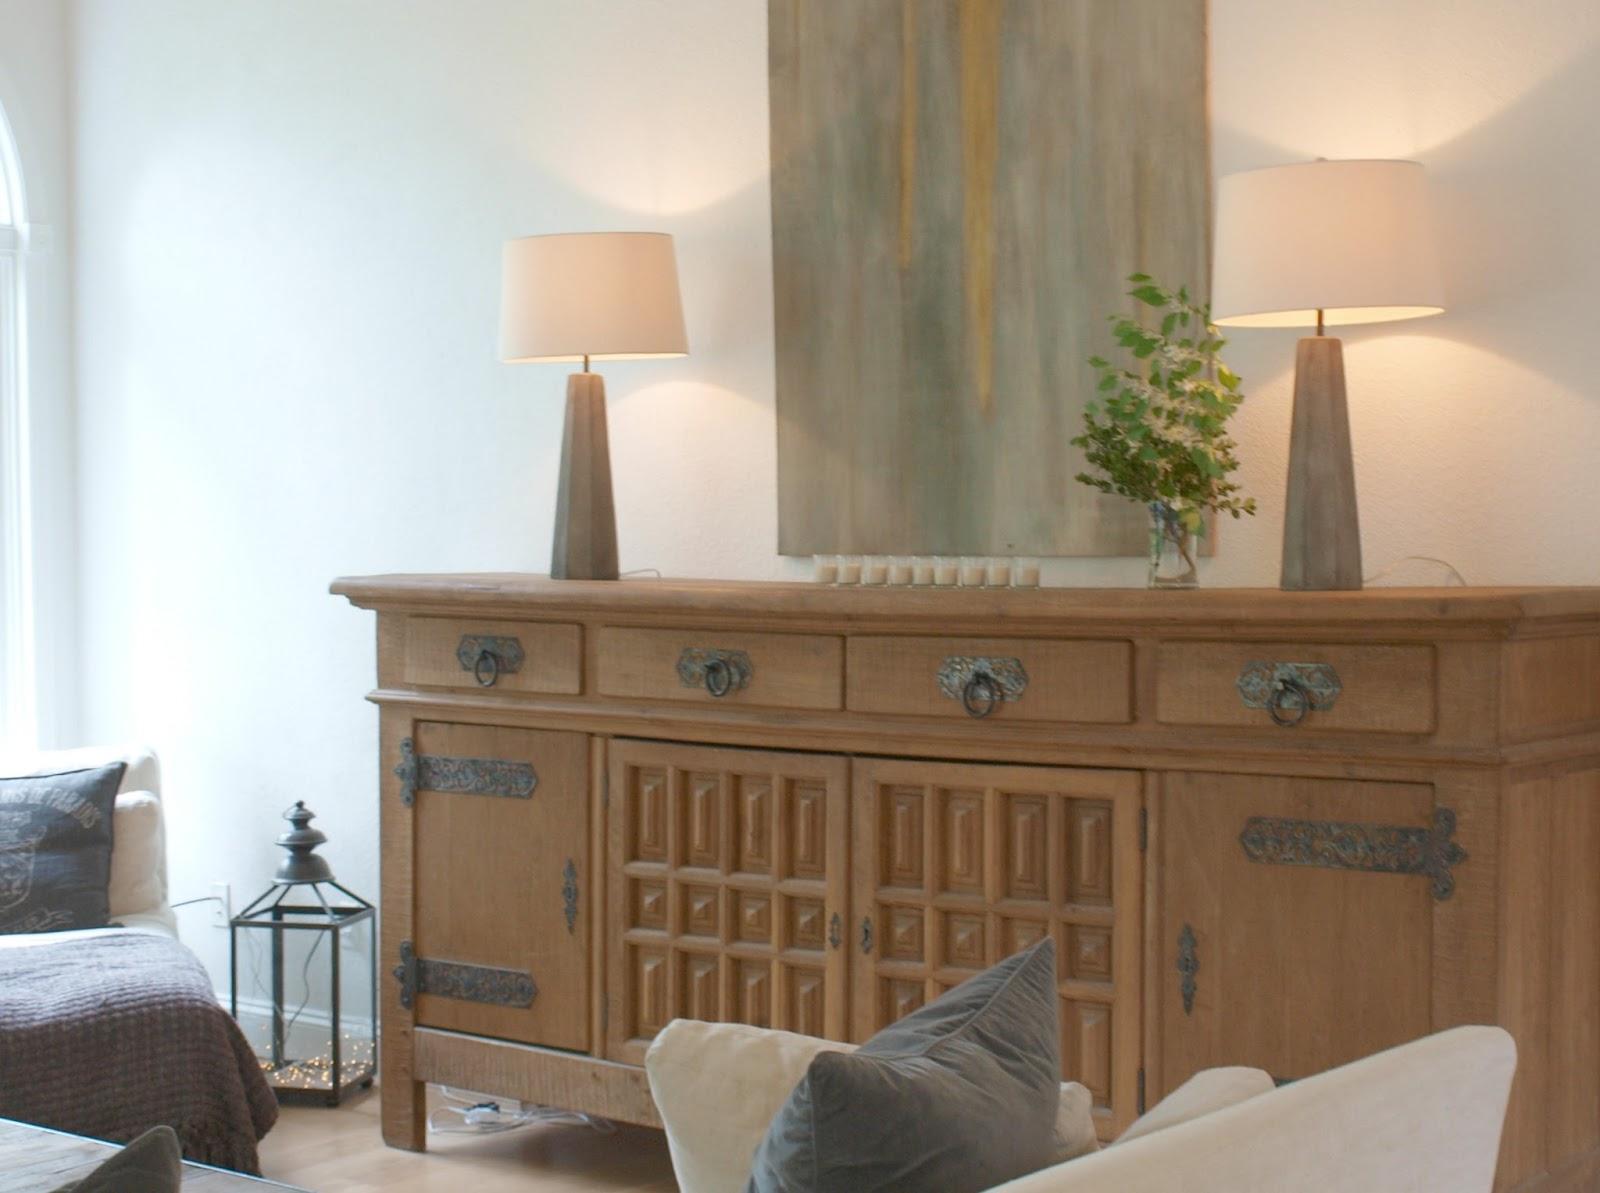 {Belgian Style Home Decor Inspiration} 20 Belgian Kitchens to Inspire!